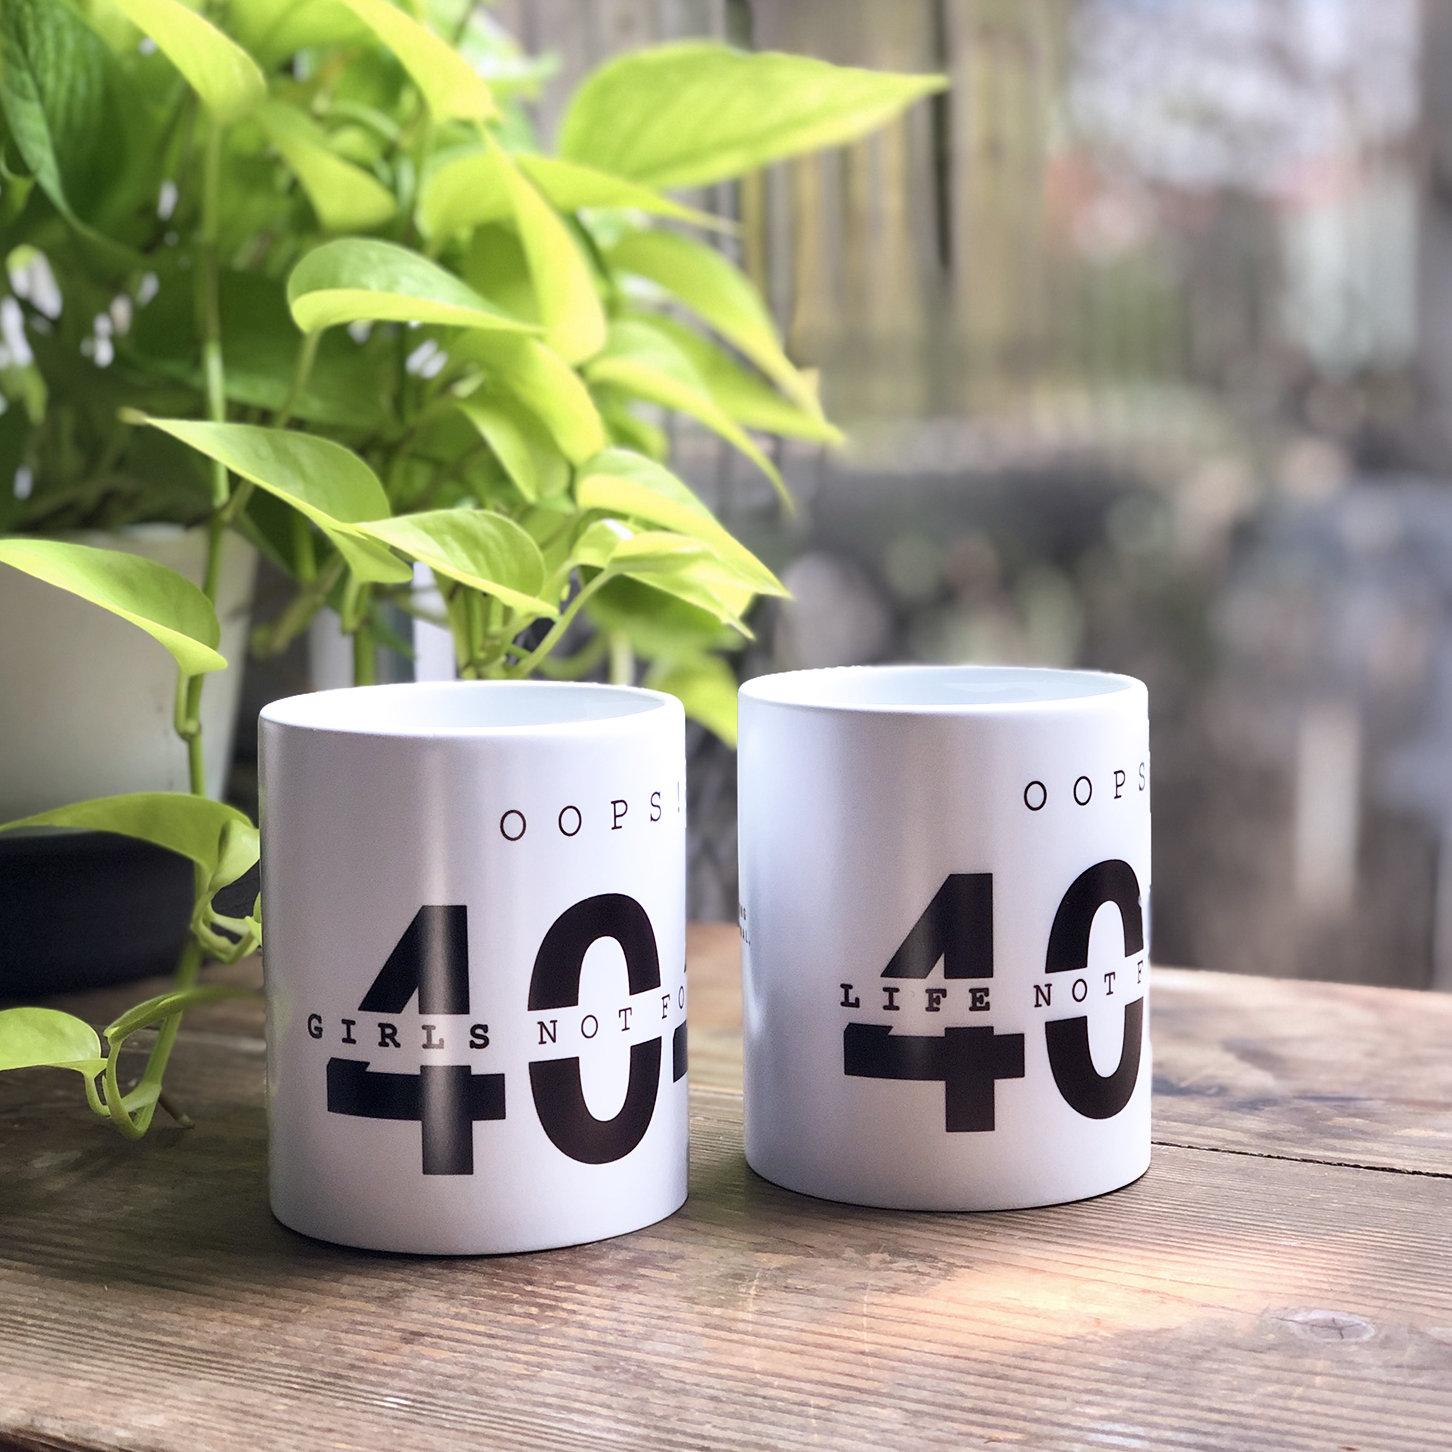 404 Life Not Found 馬克杯 (新款改版)-preview-4